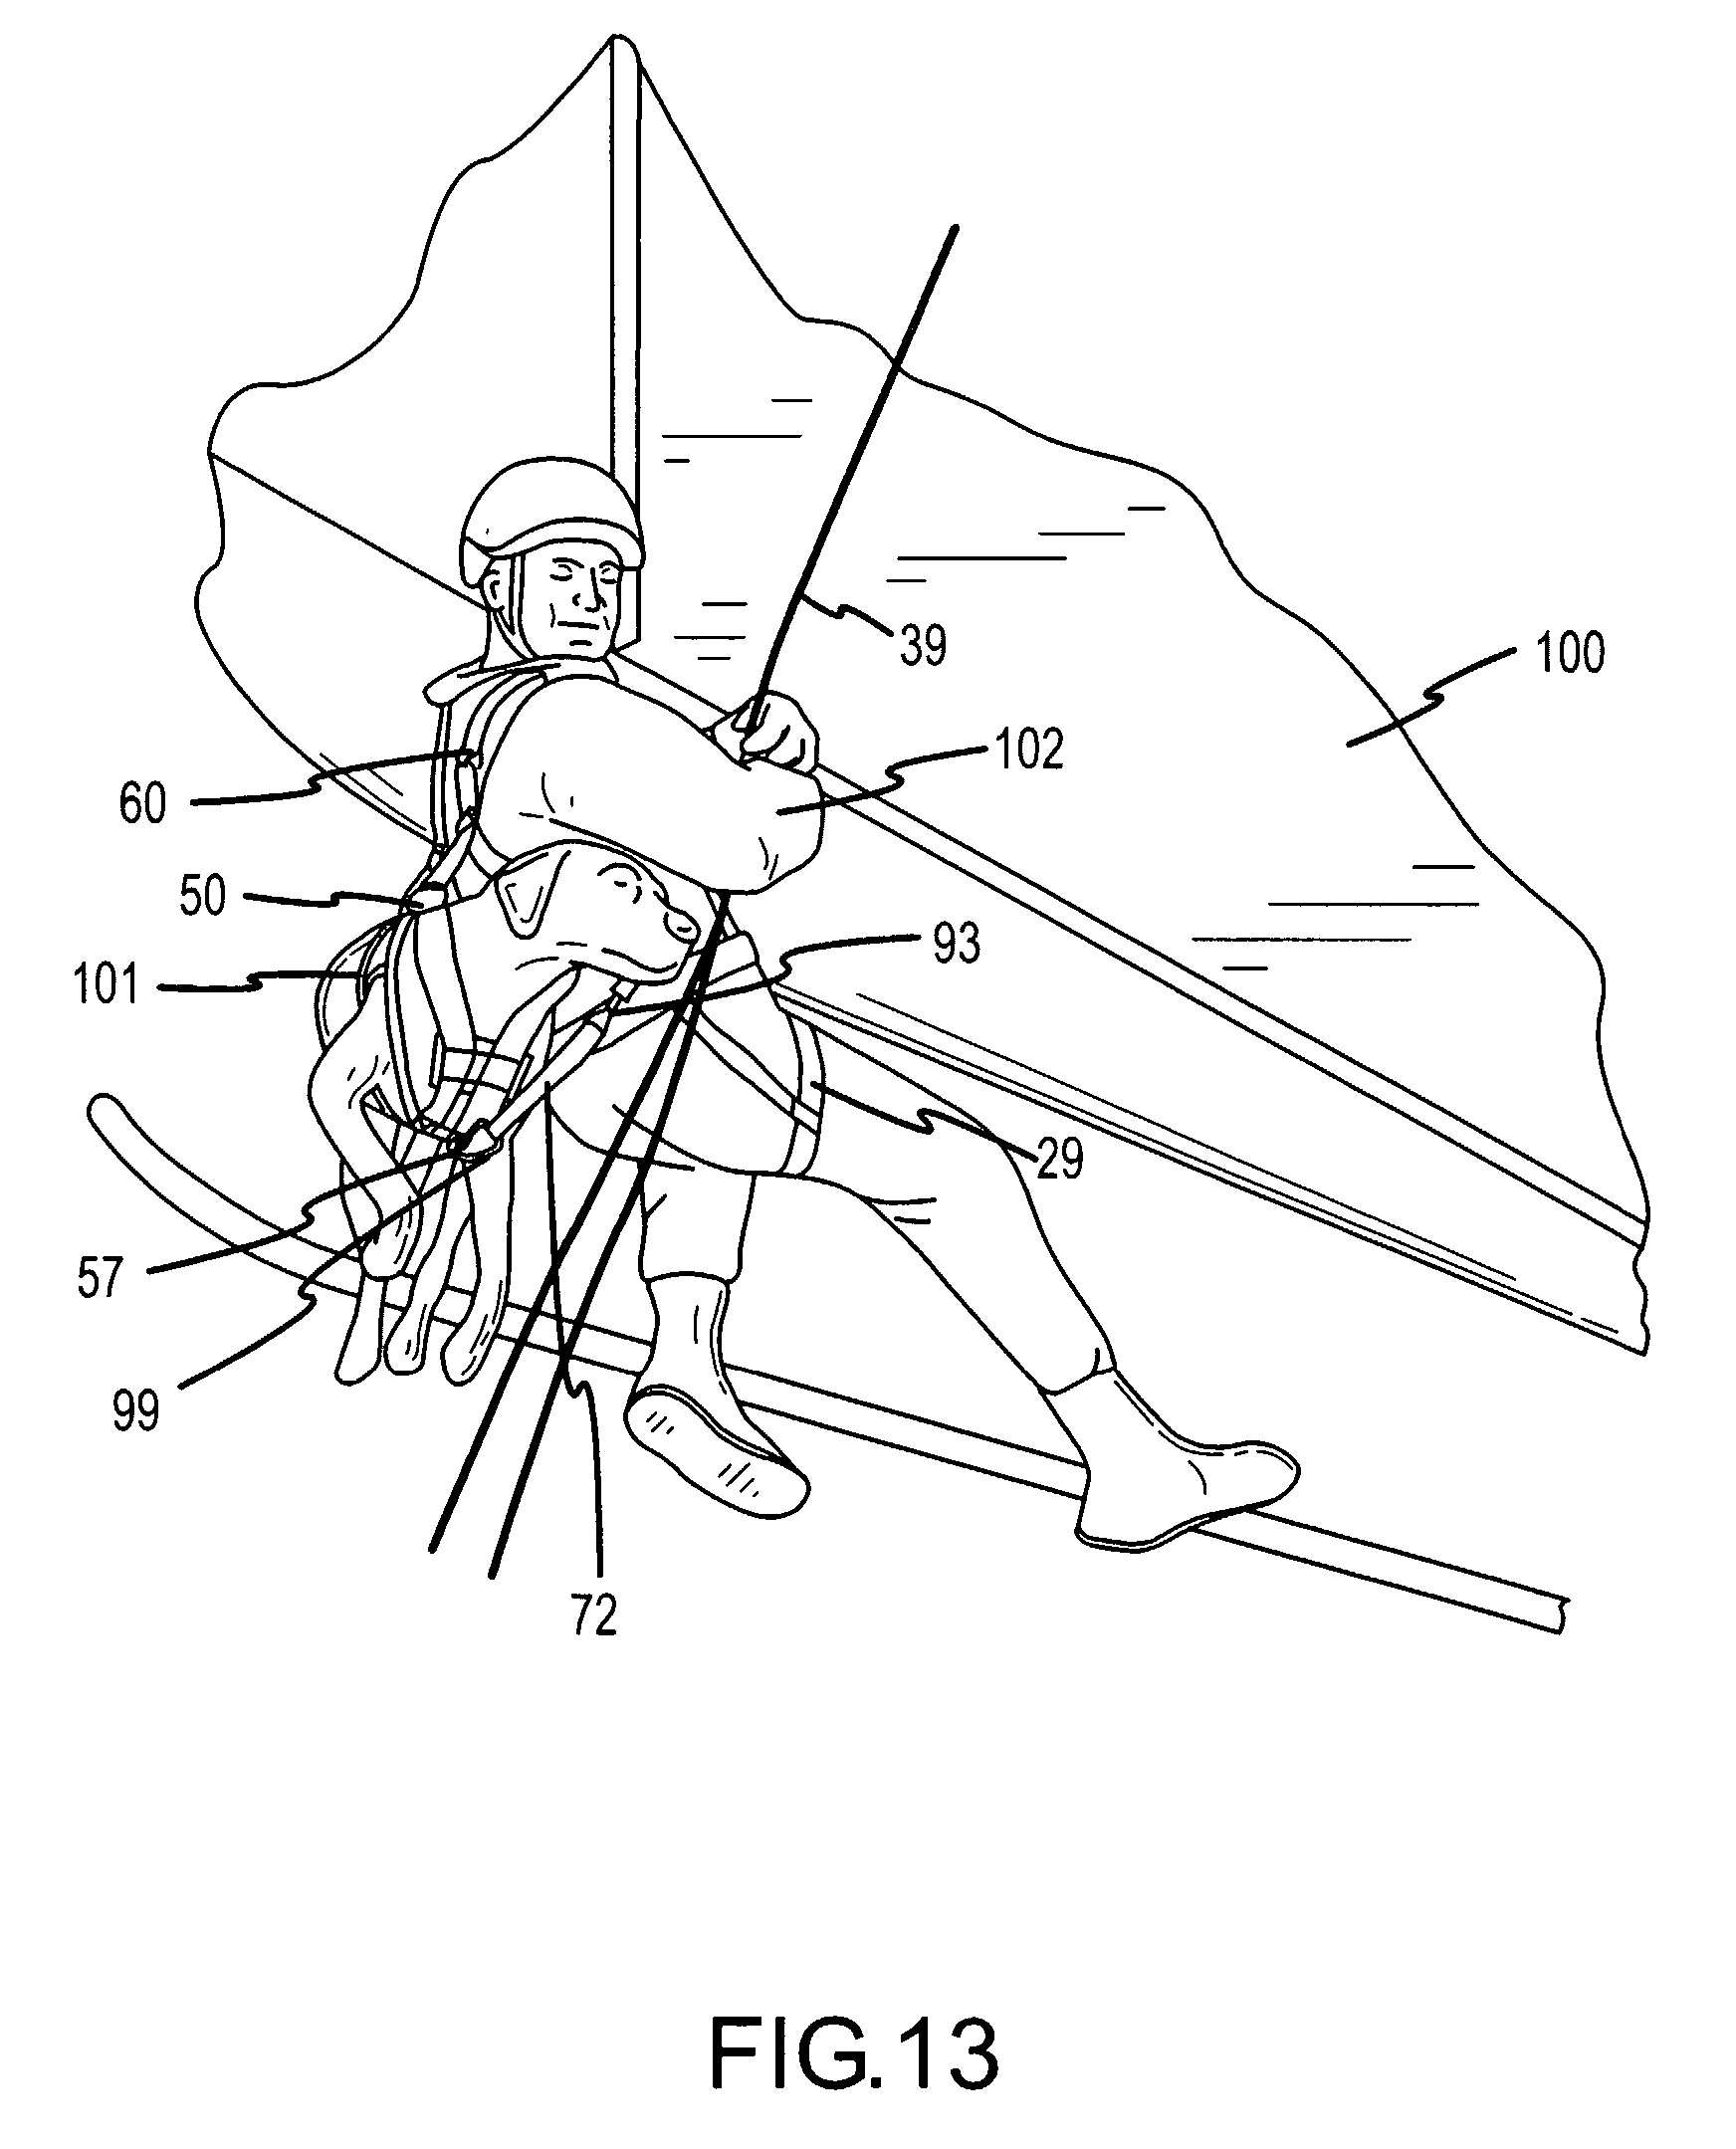 patent us7353779 - k-9 rappel harness system